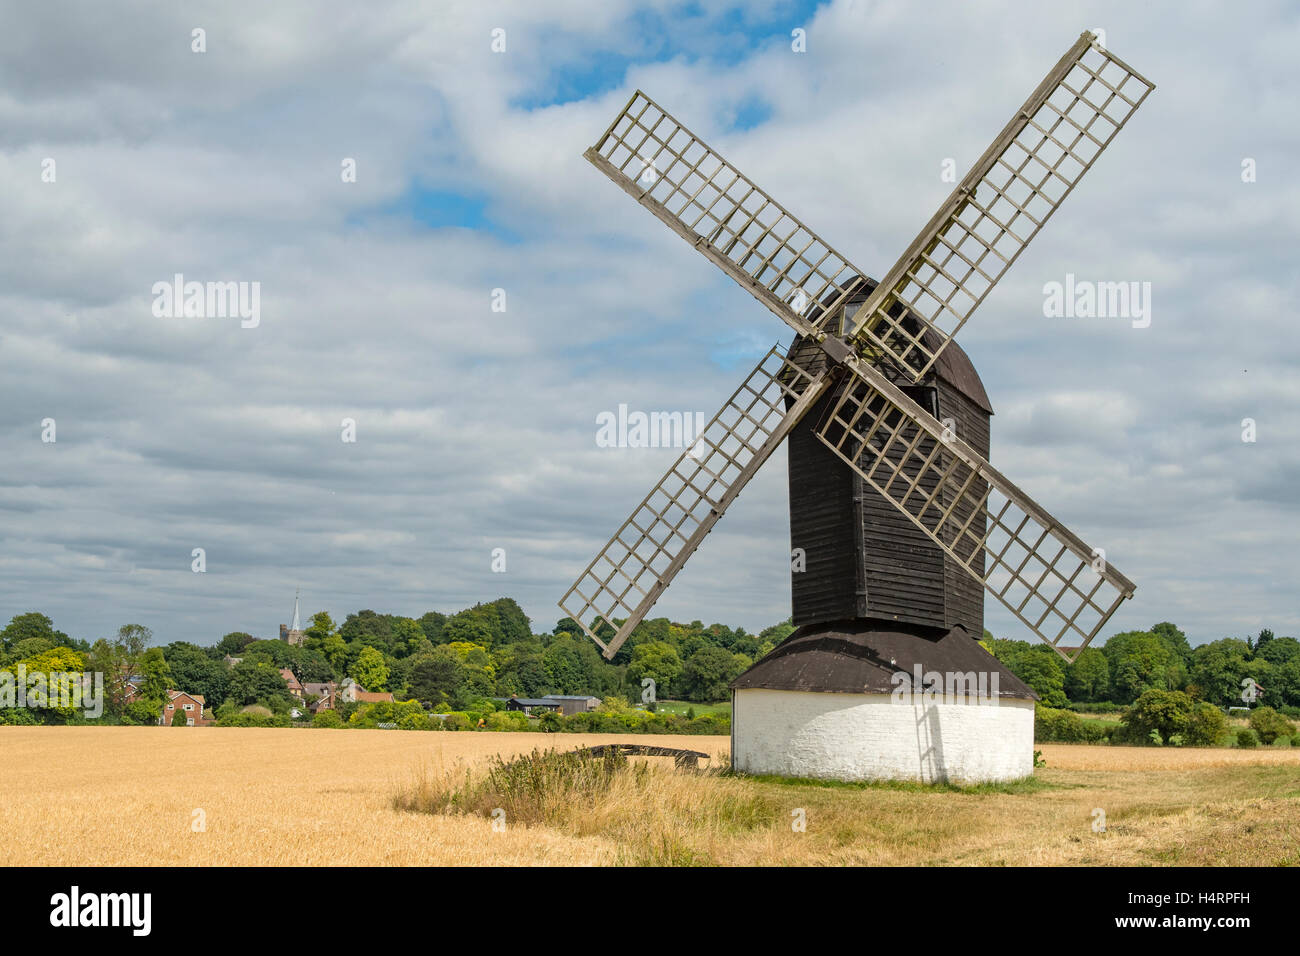 Pitstone Windmill, Ivinghoe, Hertfordshire, England - Stock Image